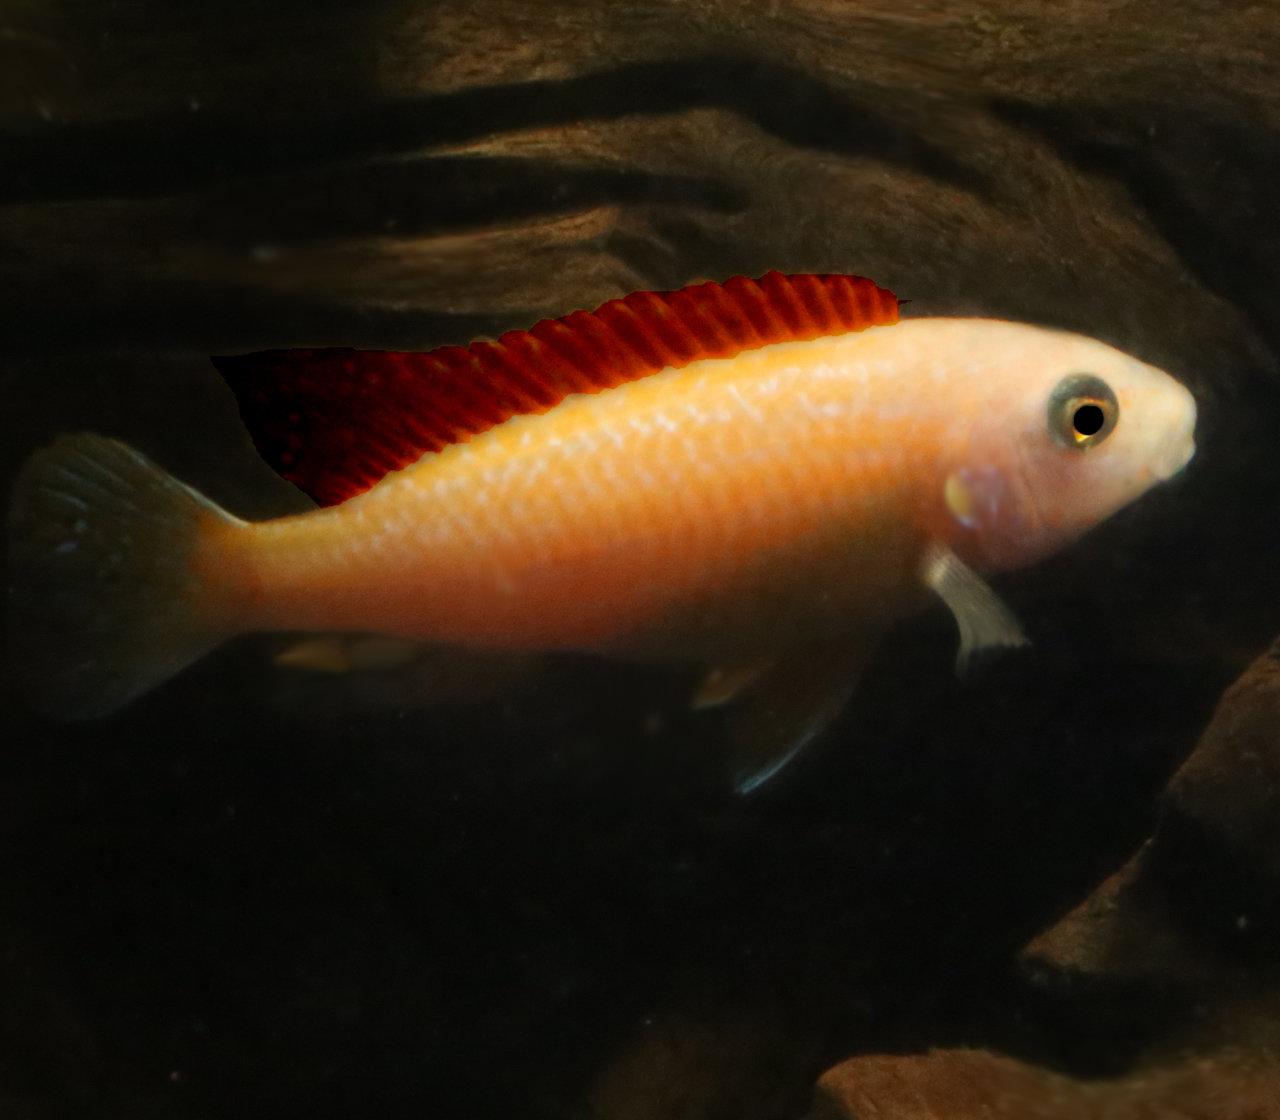 "Premium, New and Rare, Red Exasperatus Mbuna Cichlid, 1.5"" to 2"" long"